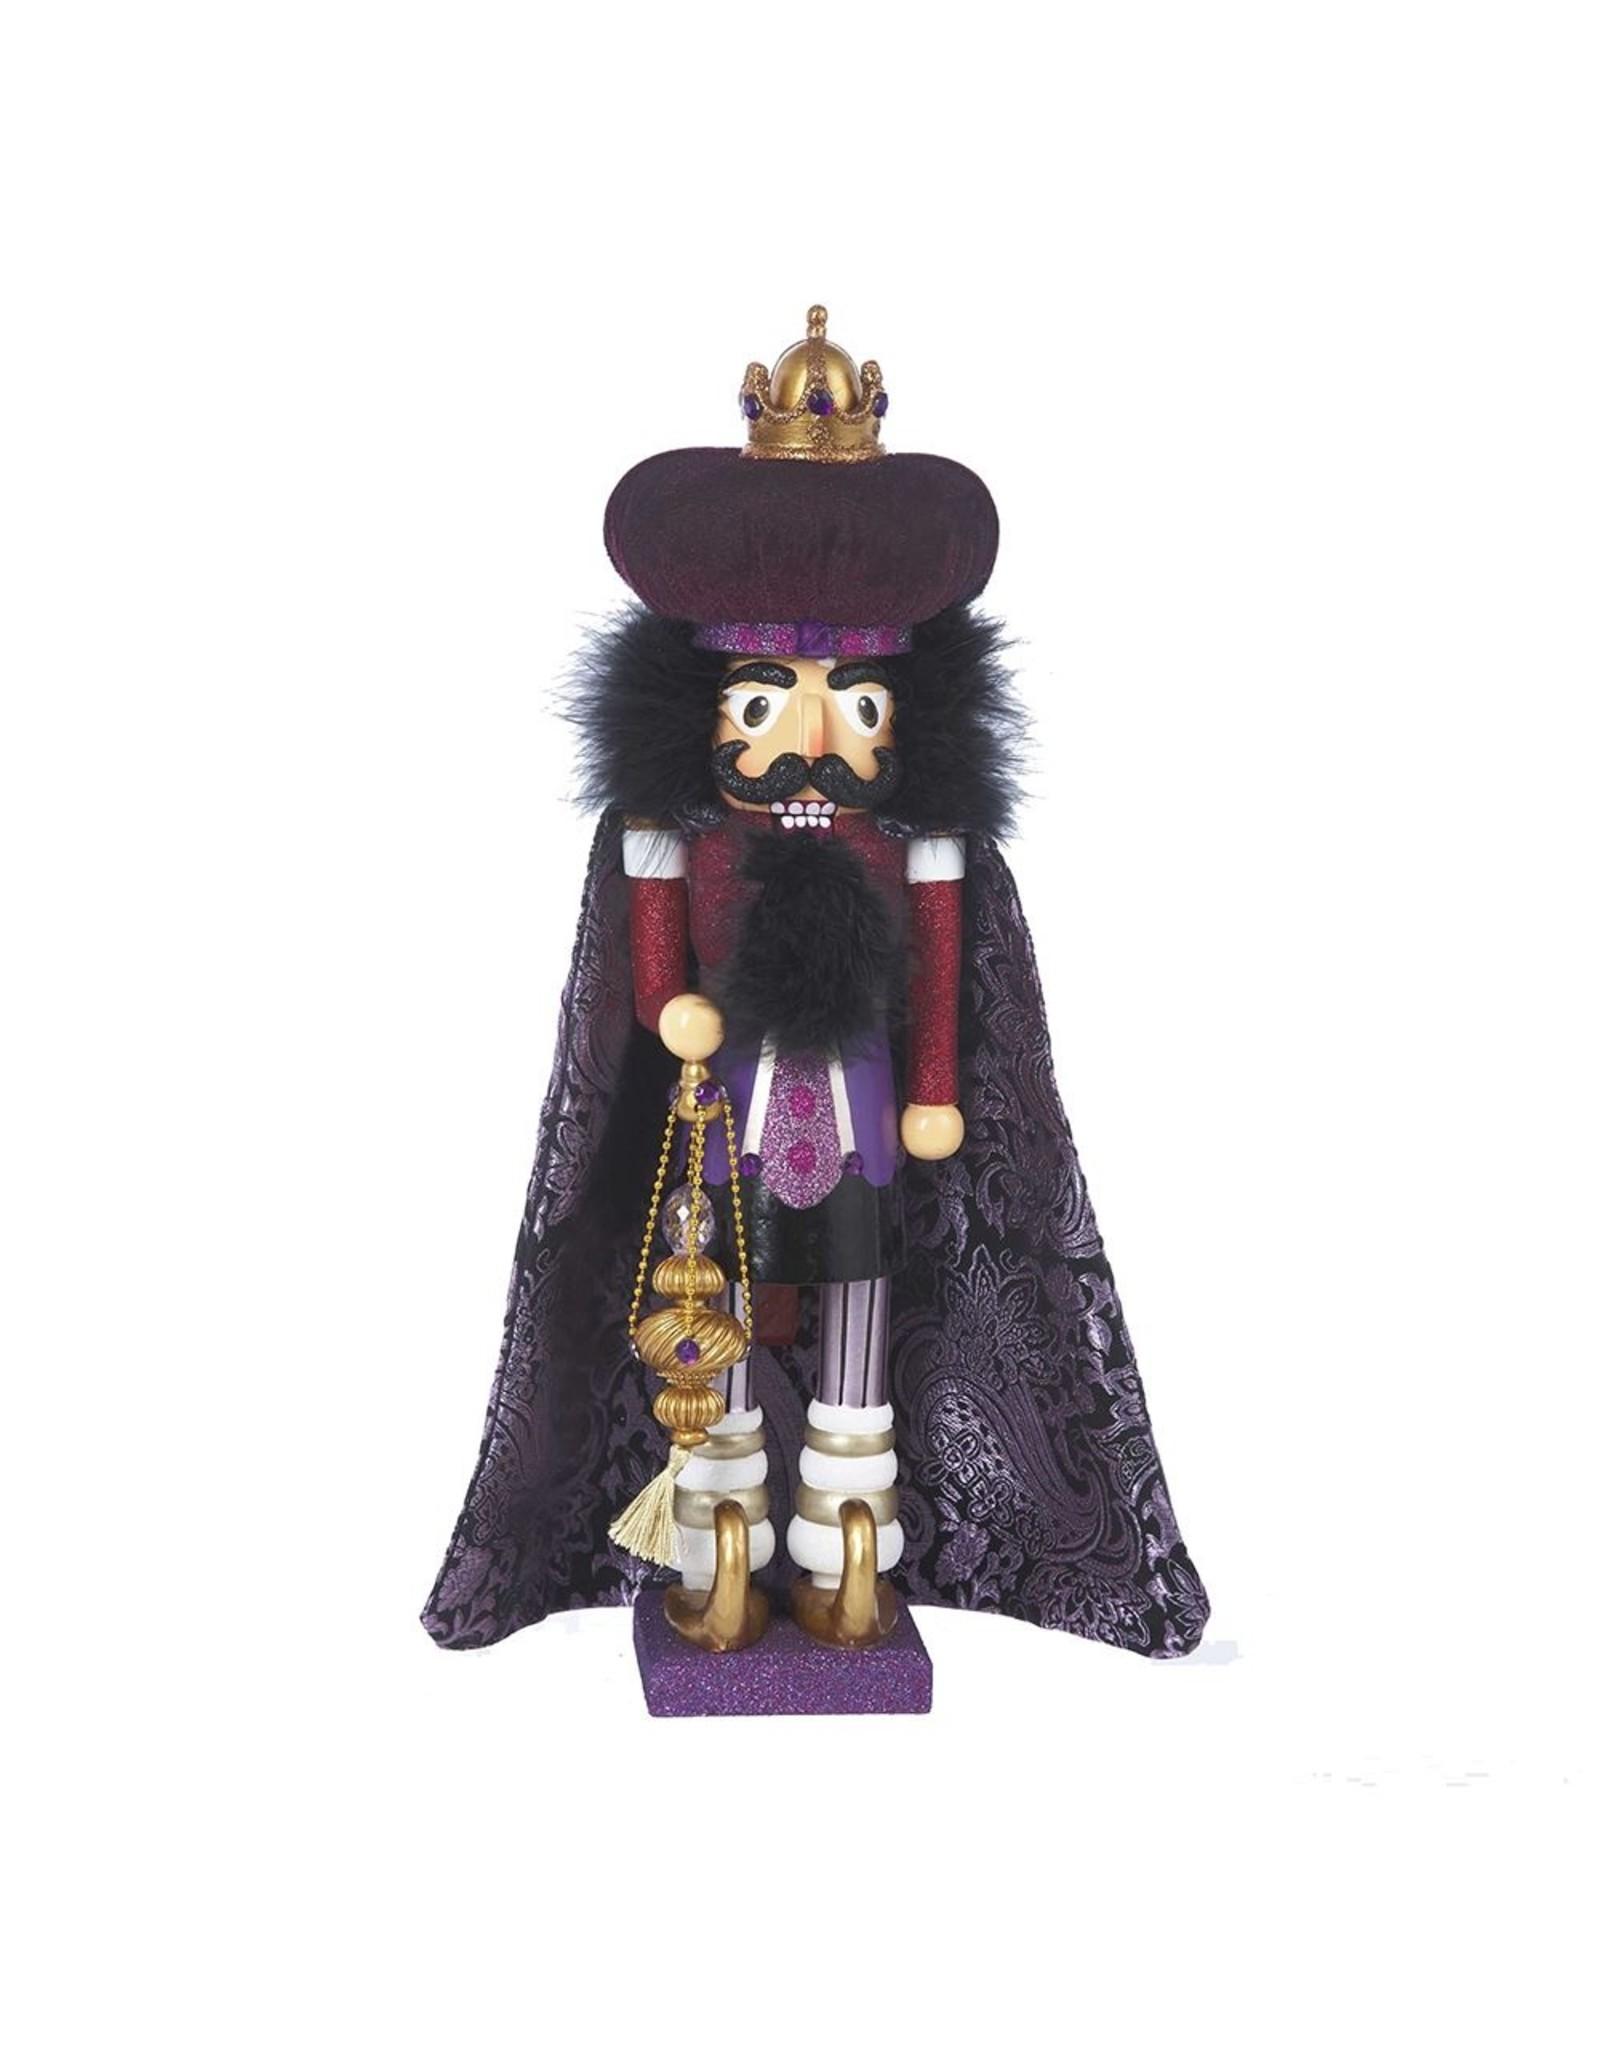 Kurt S. Adler Purple Wiseman Nutcracker